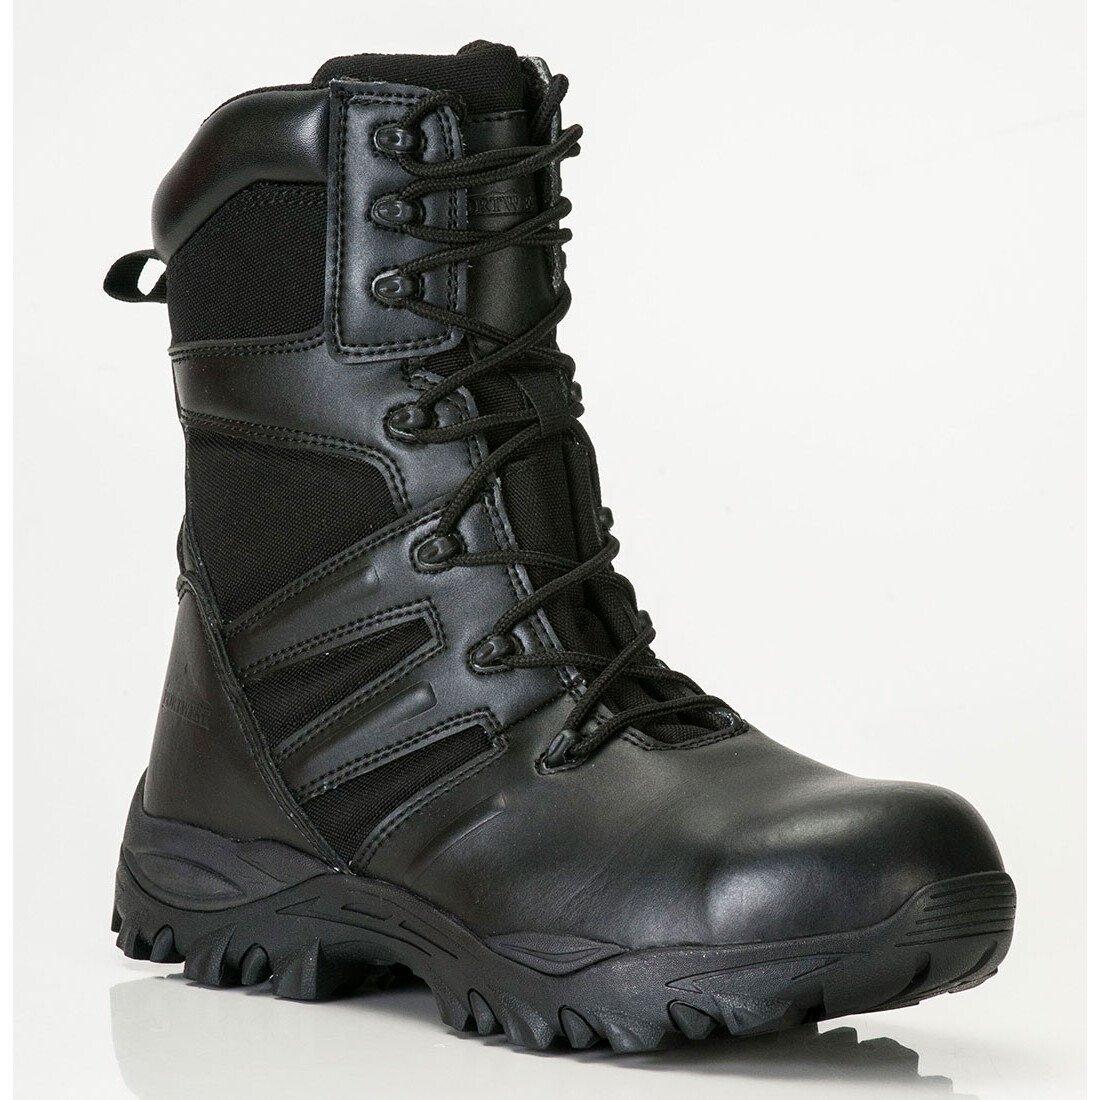 Portwest FW65 Steelite TaskForce Boot S3 HRO - Black